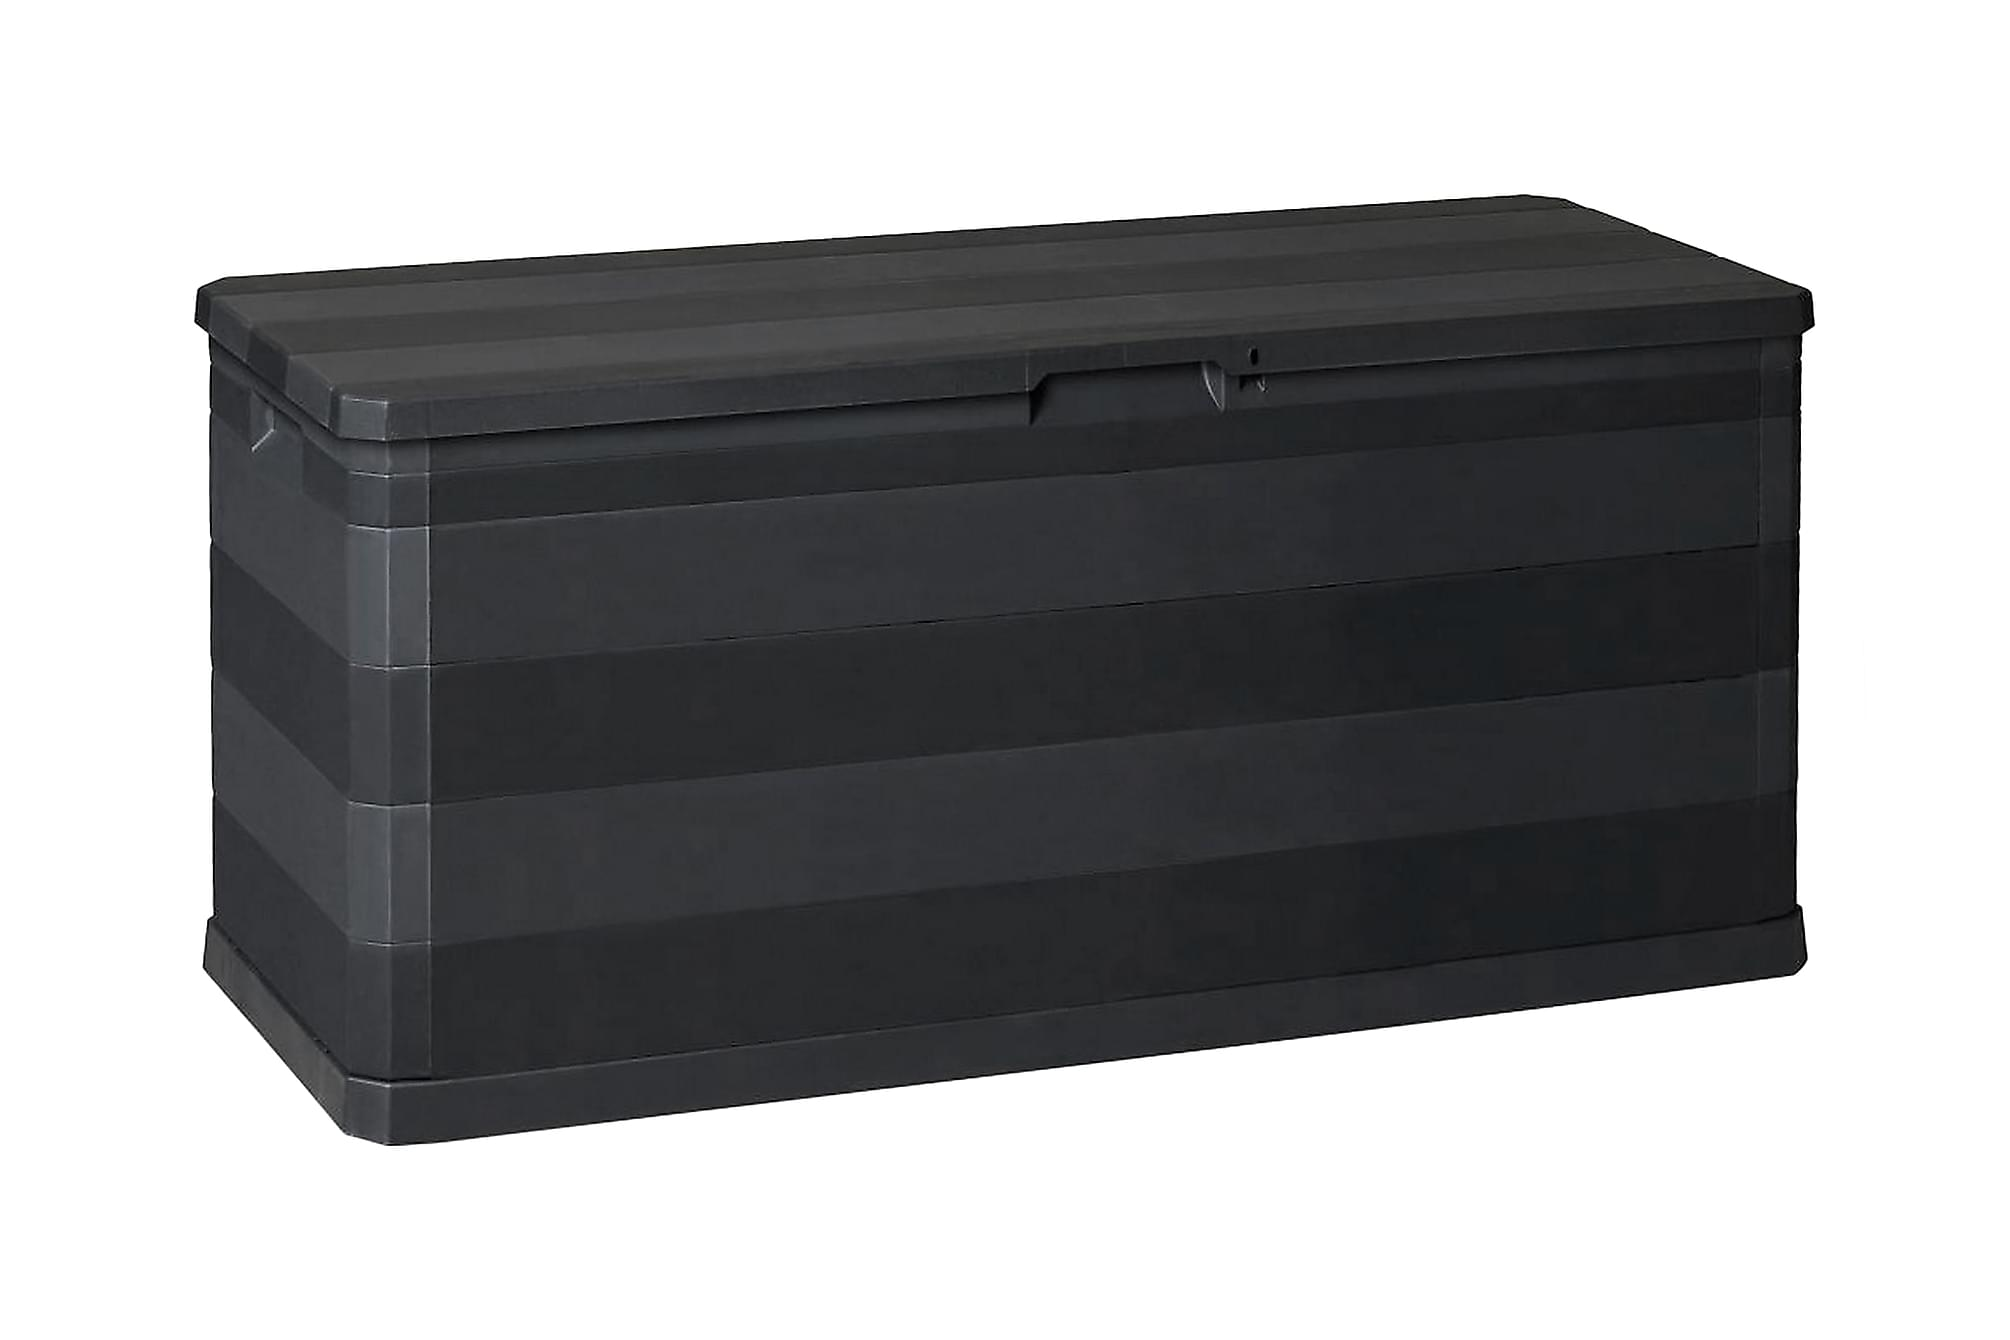 Rosco Dynbox 117x45x56